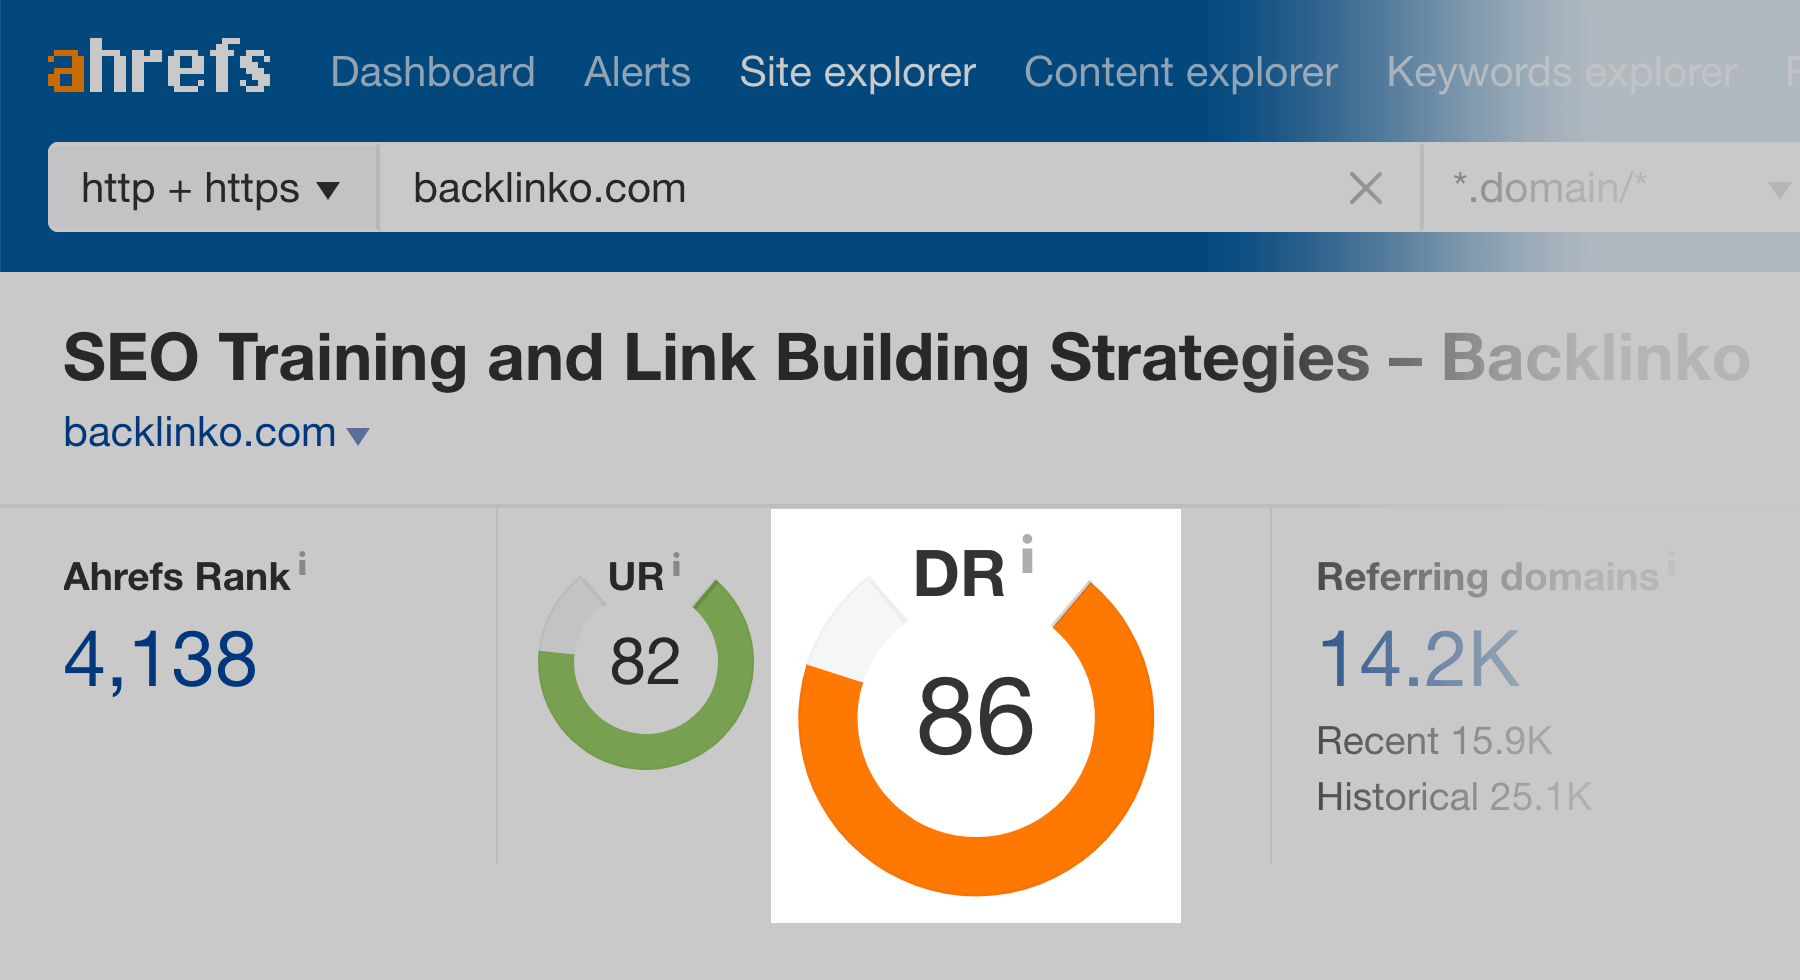 Ahrefs – Backlinko Domain Rating